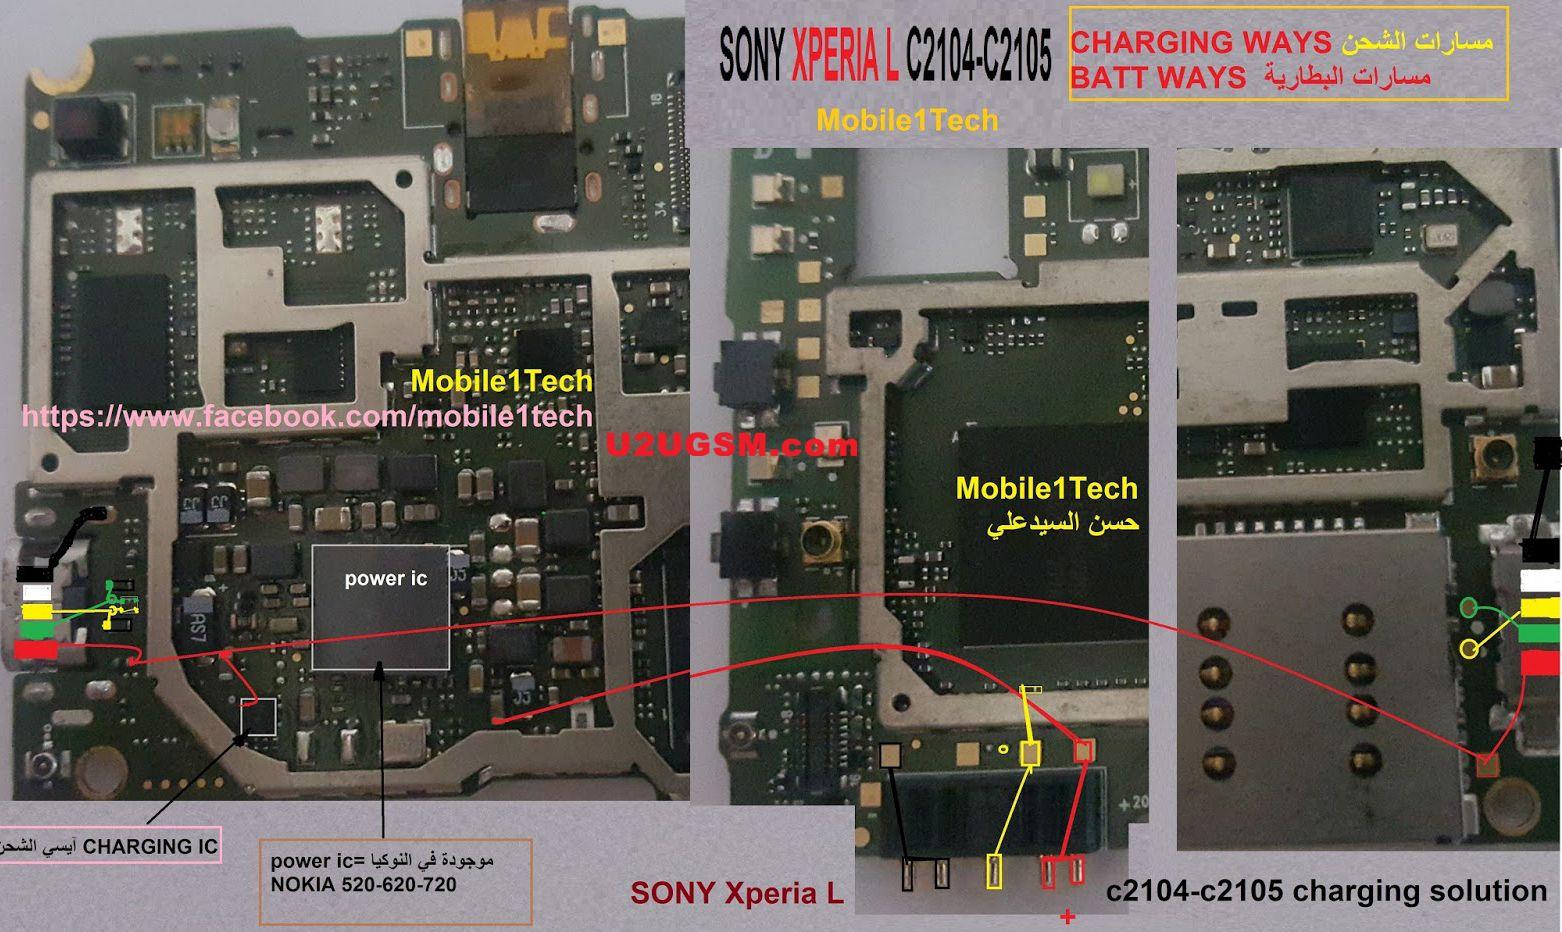 Sony Xperia Neo L Circuit Diagram - Wiring Diagram List on